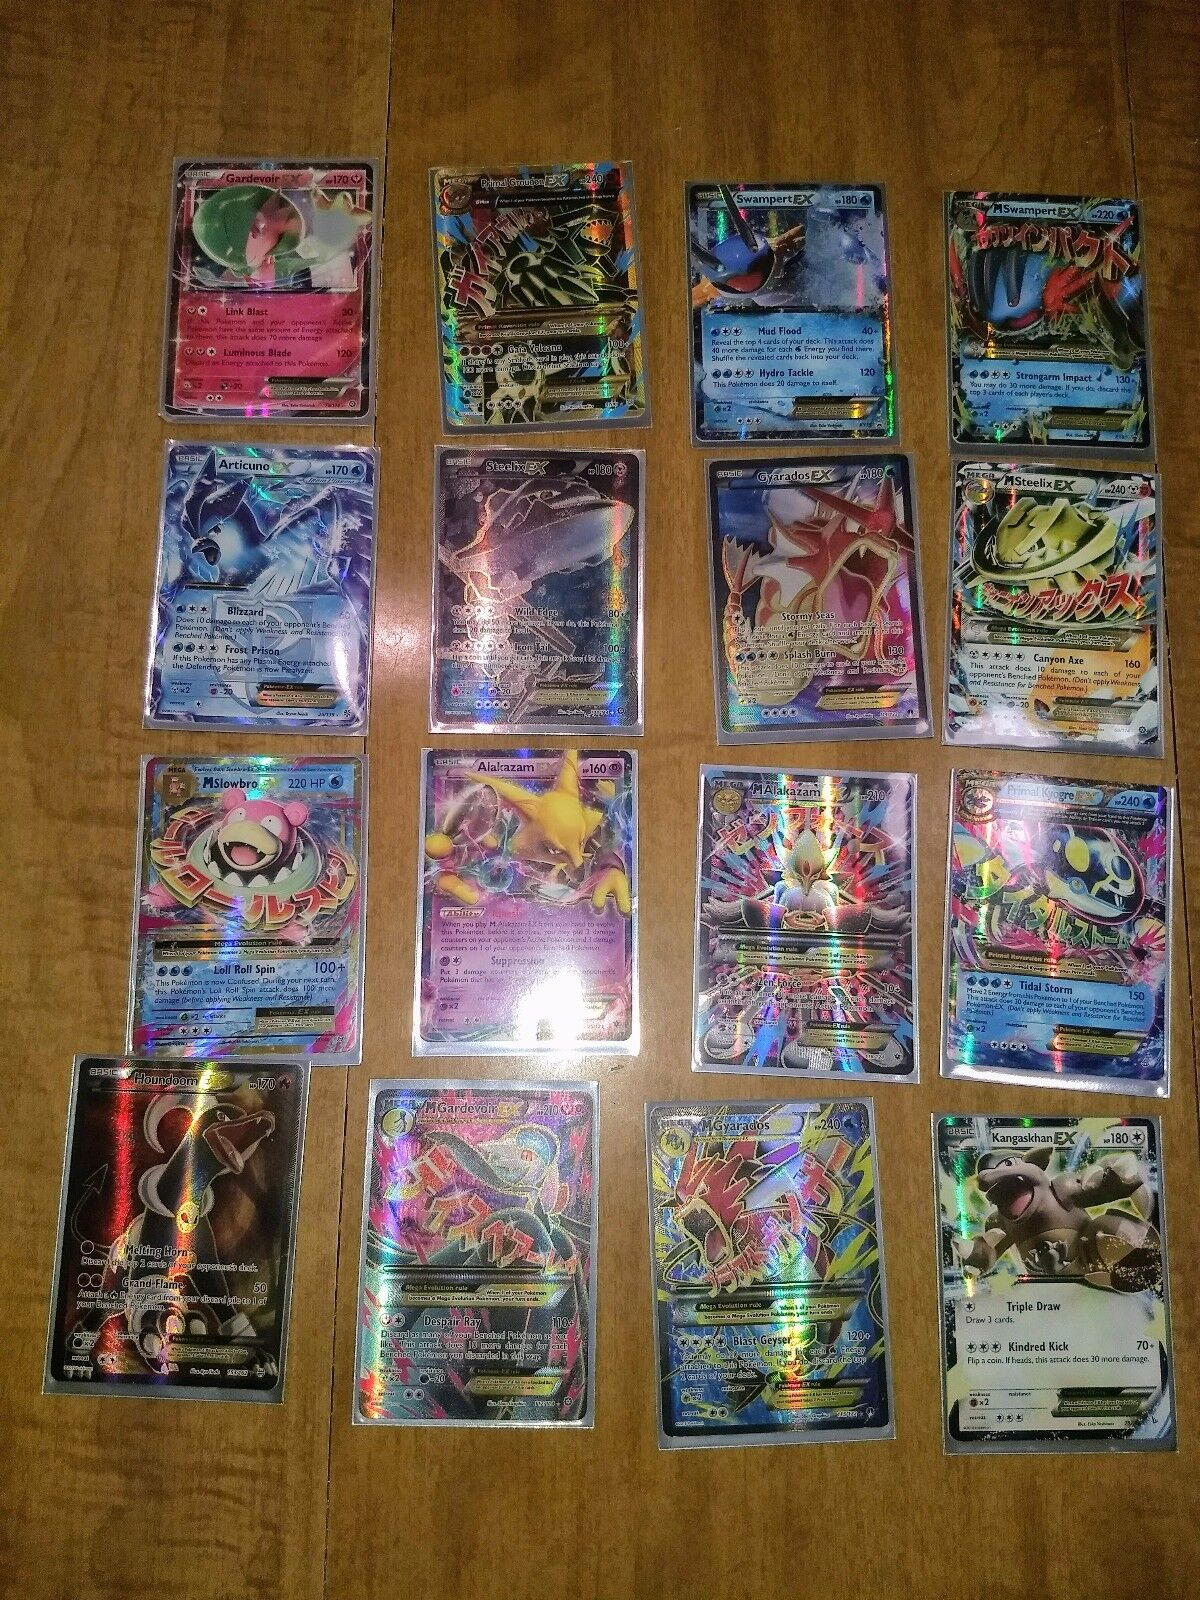 Pokemon card lot of 16 including EXs, Mega, full art, and ultra rares. Mint.